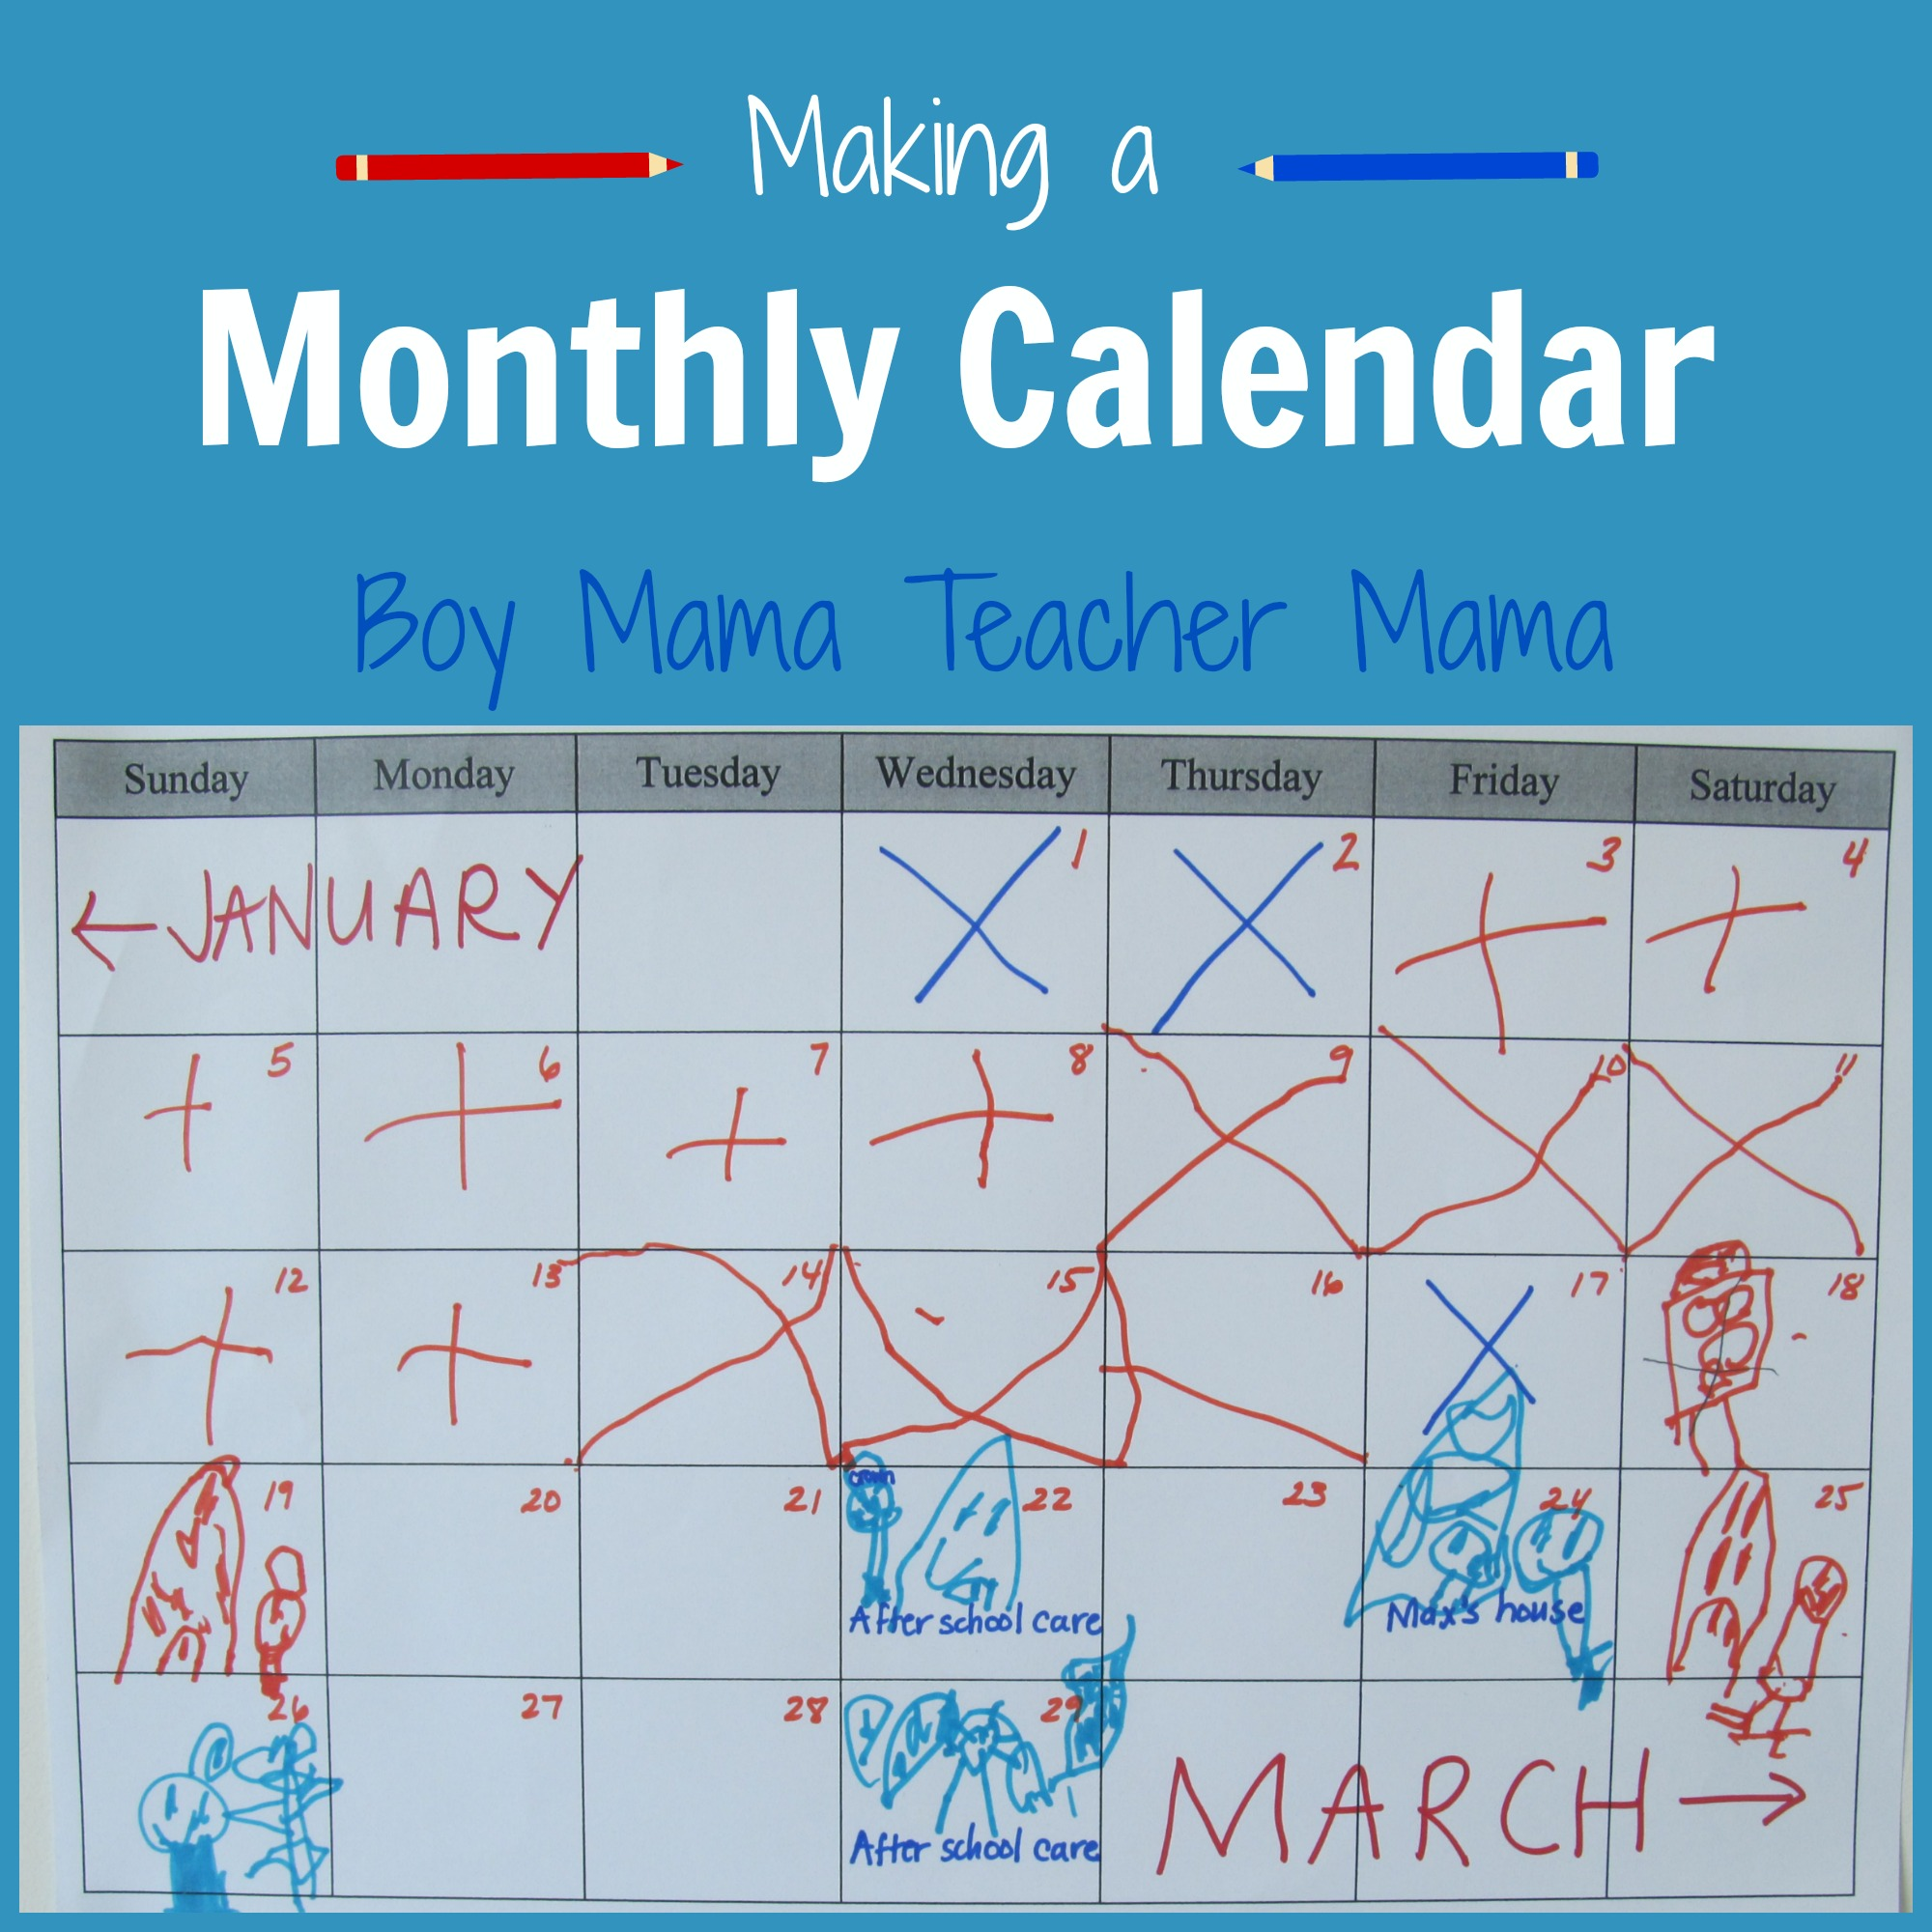 teacher mama making a monthly calendar boy mama teacher mama